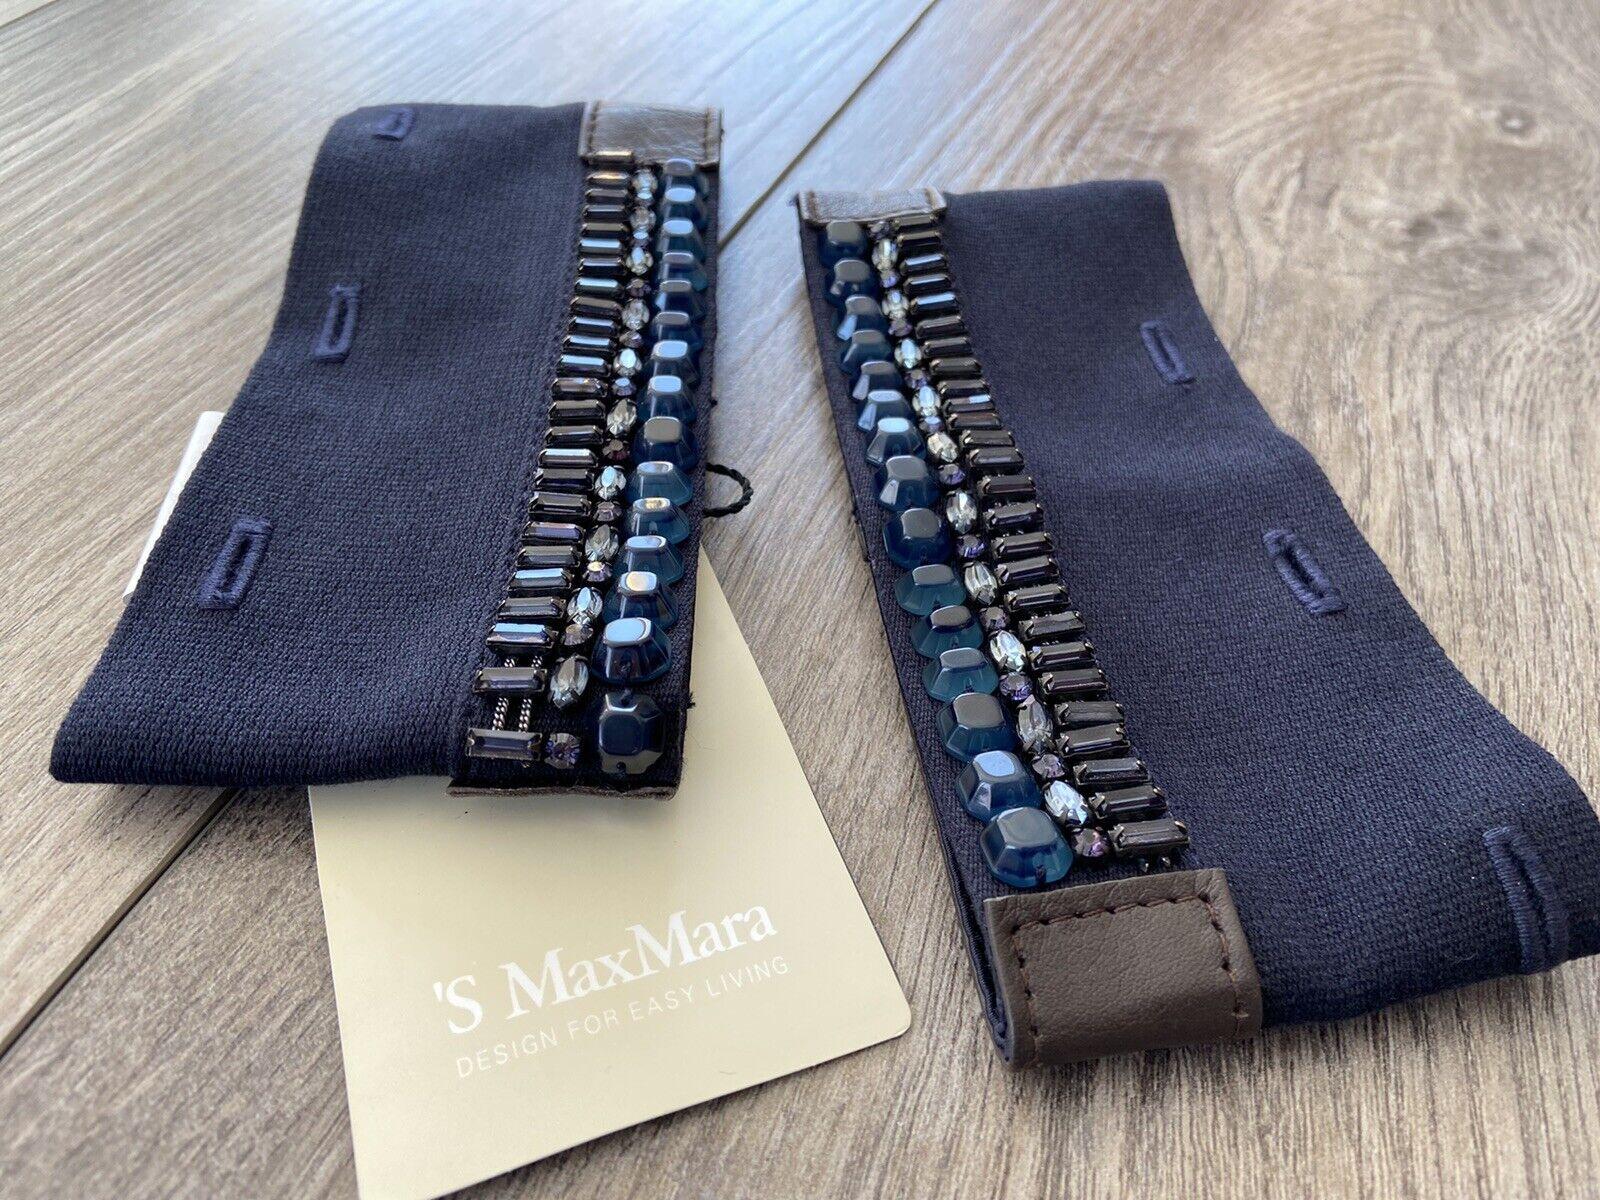 S Max Mara Women's Cufflinks 2 piece Accessories Nigeria Blue NWT